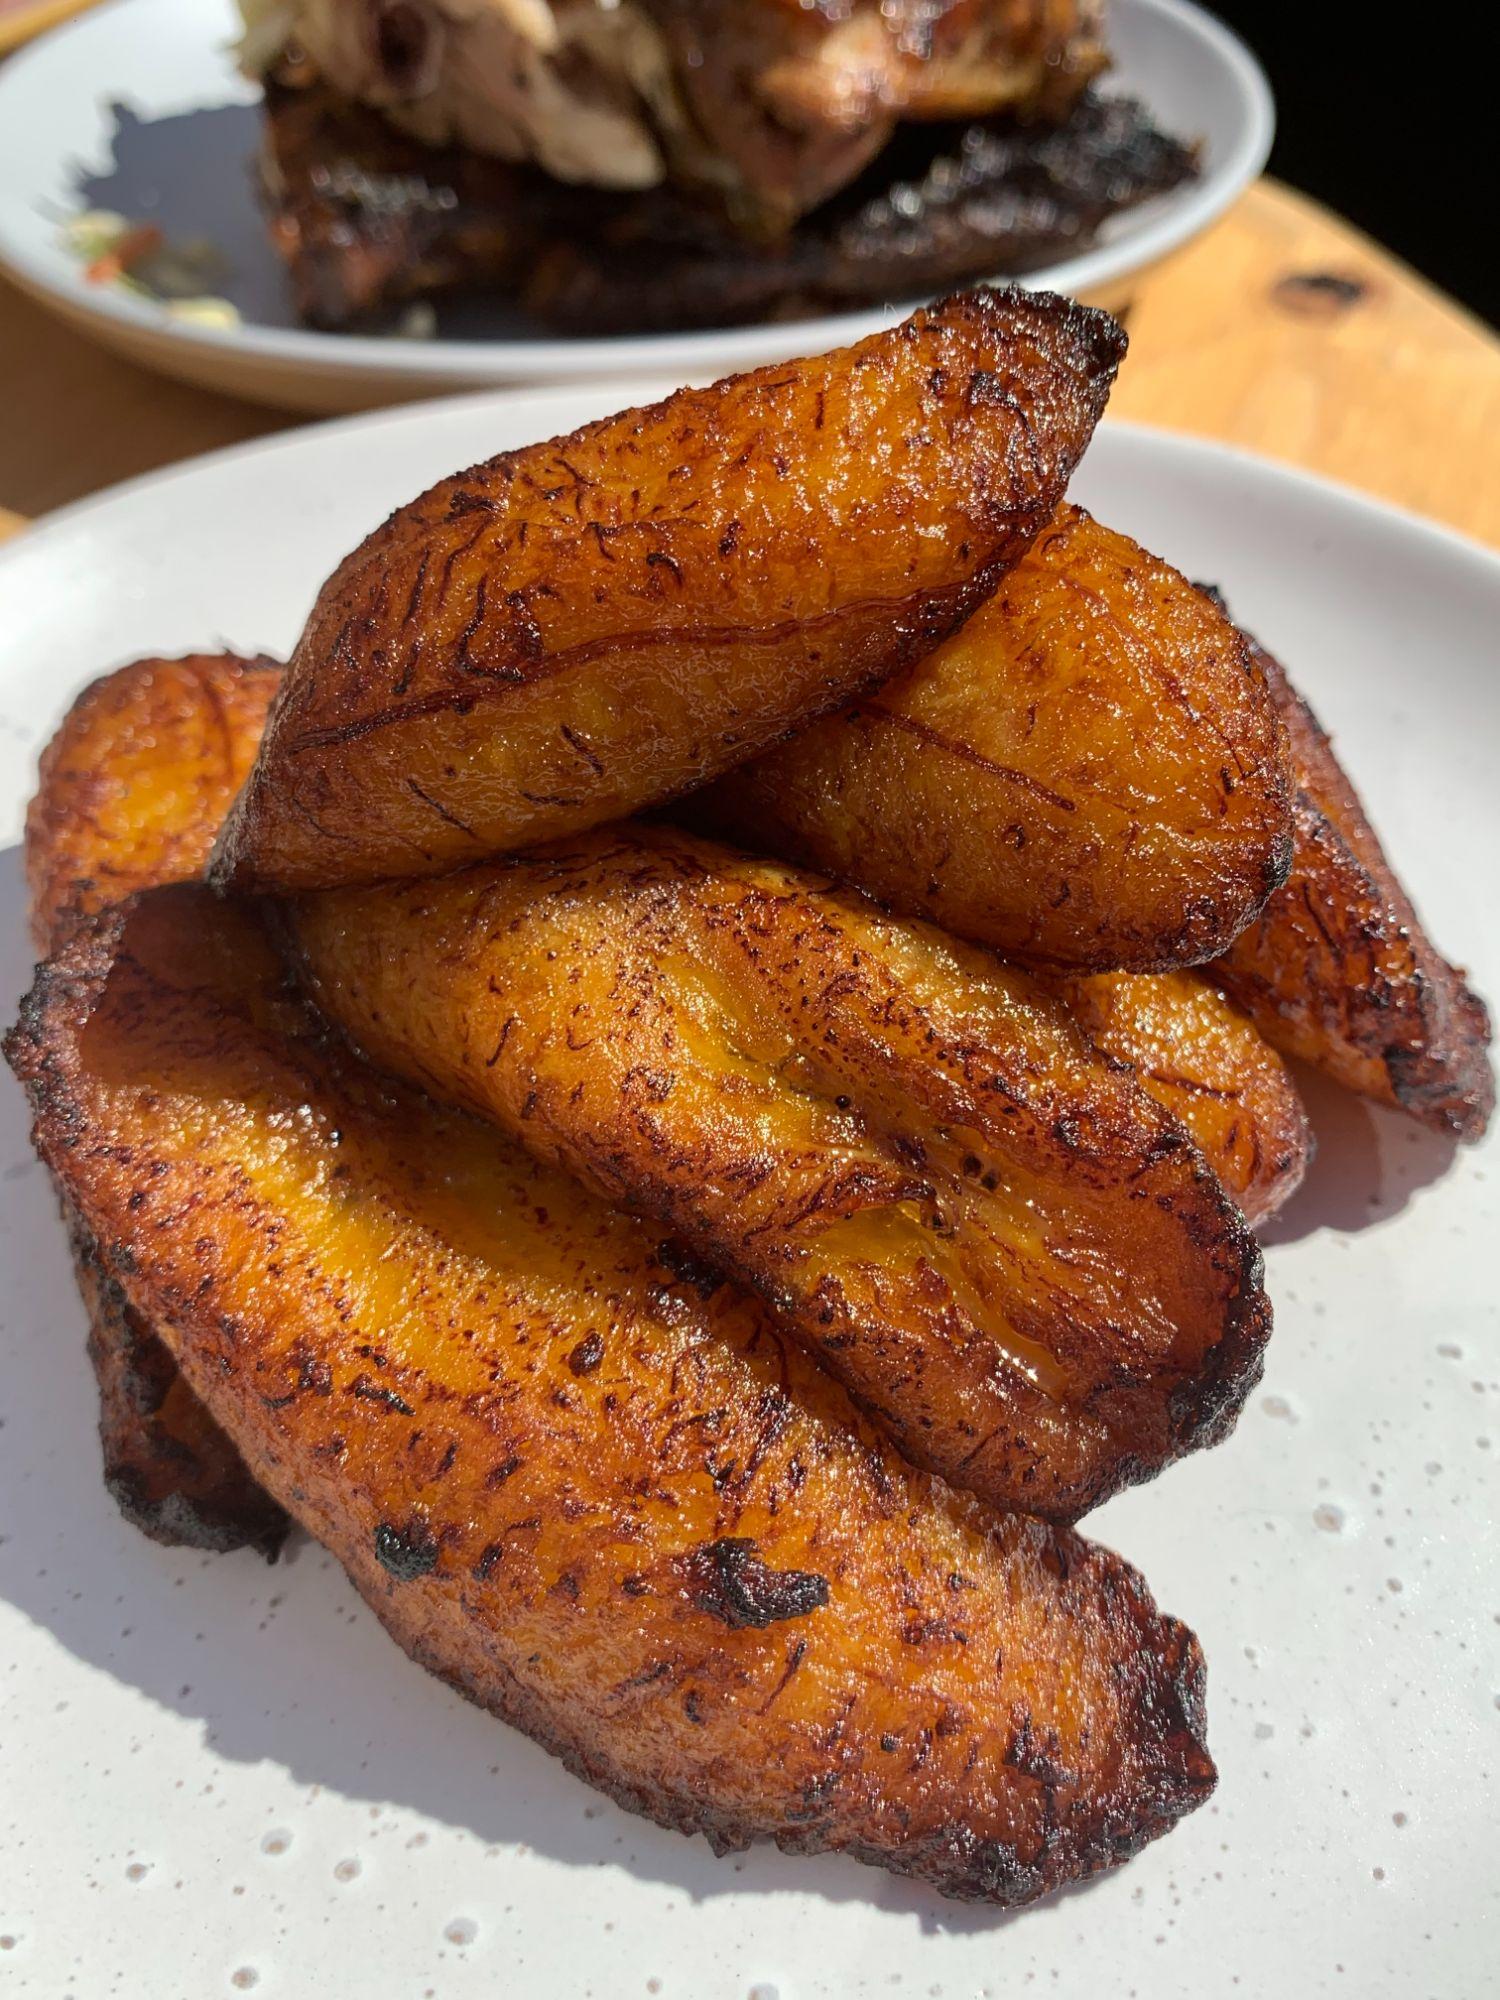 Jamaican Fried Plantain and Caribbean Food Perth, Western Australia